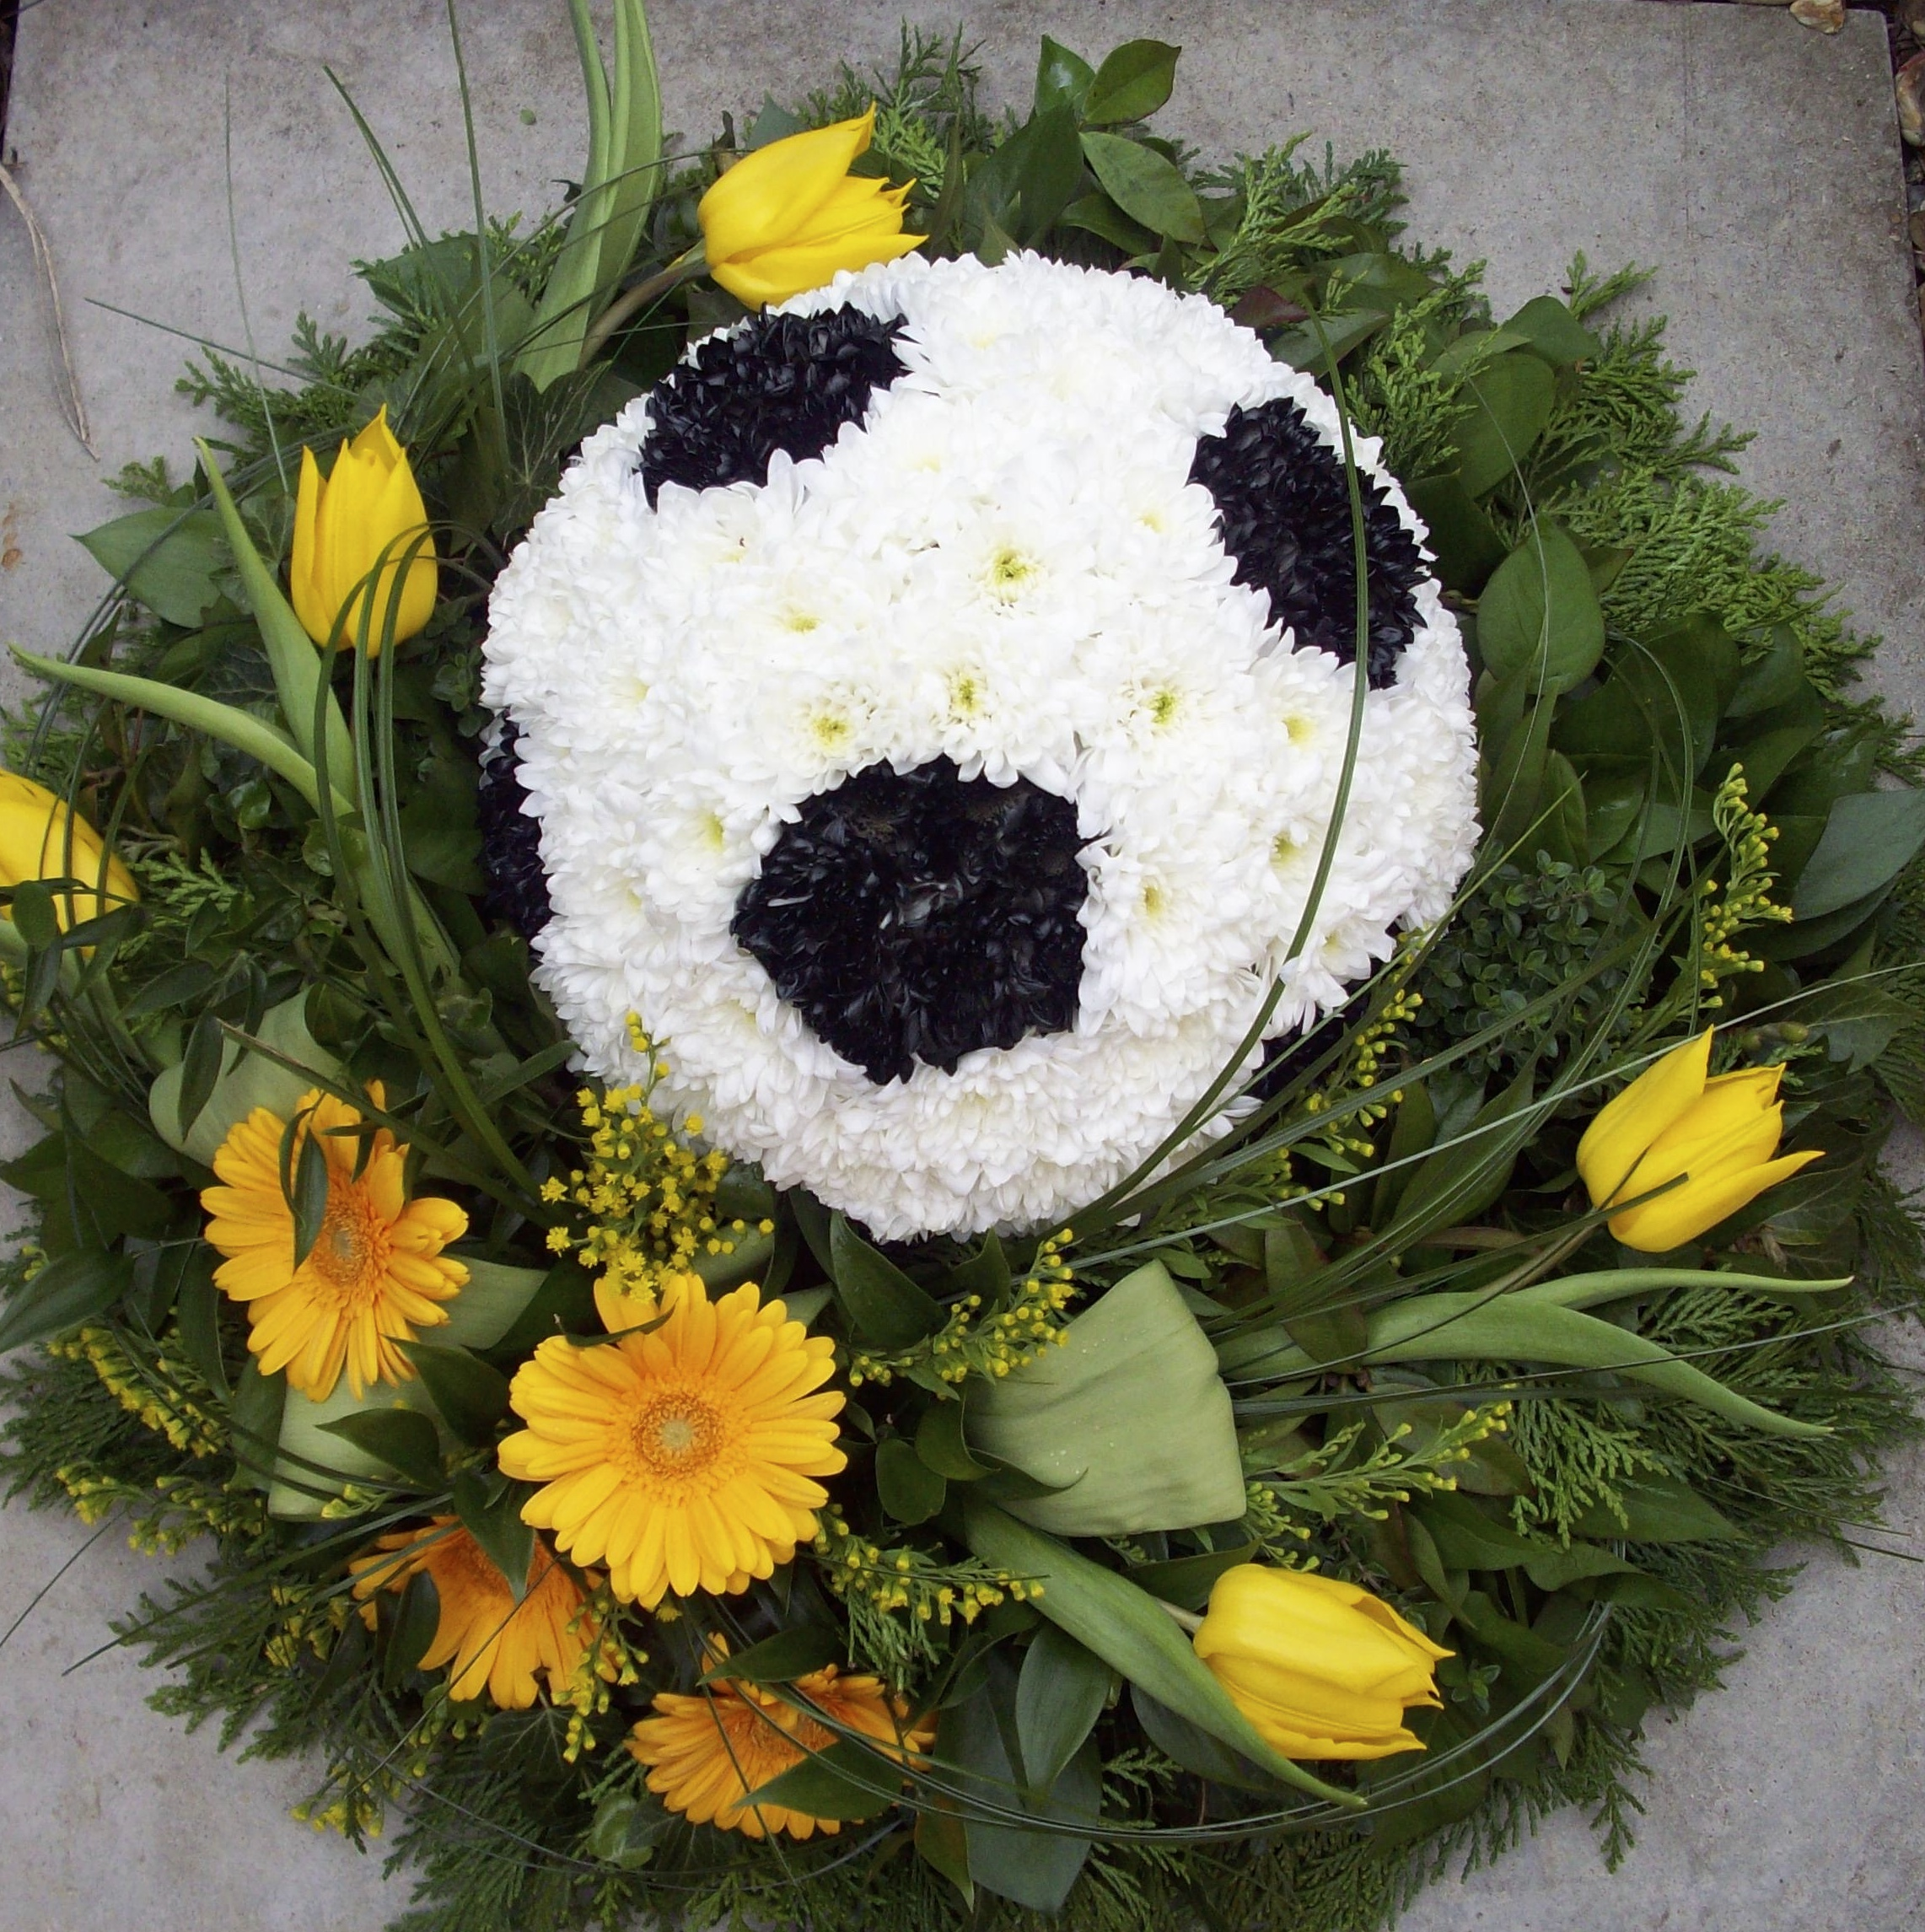 Sympathy flowers and tributes the secret garden florists heart tribute wymondham football tribute norfolk 1001190 p1030343 izmirmasajfo Images